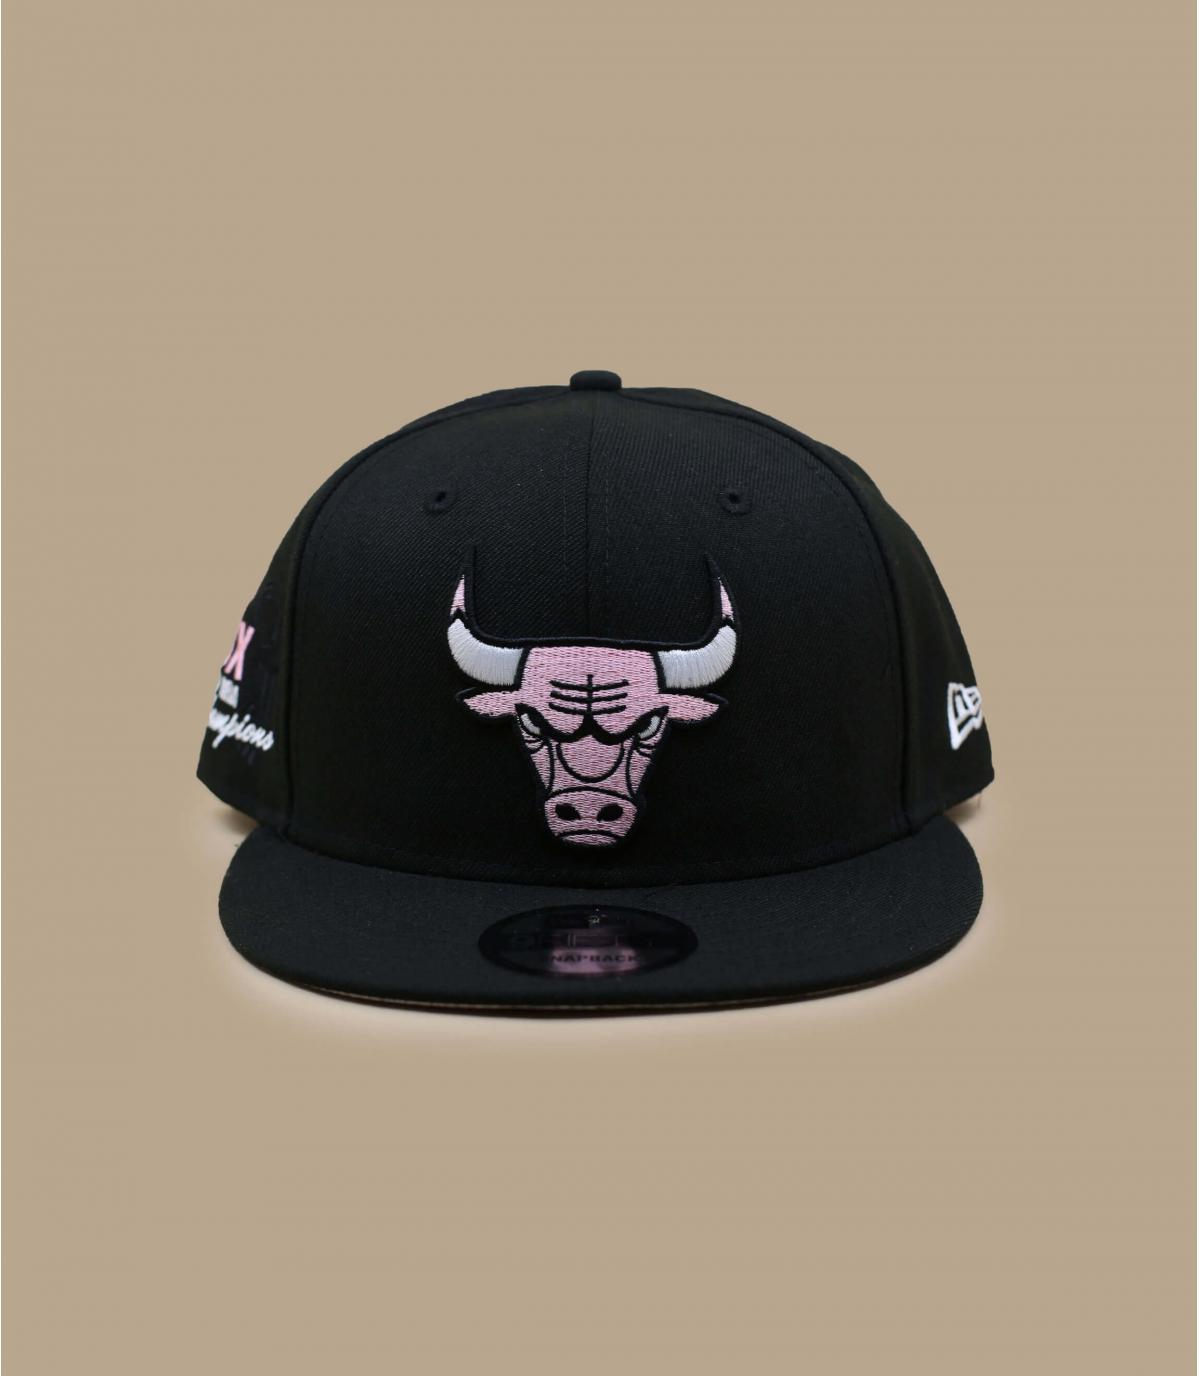 Casquette Bulls bandana rose